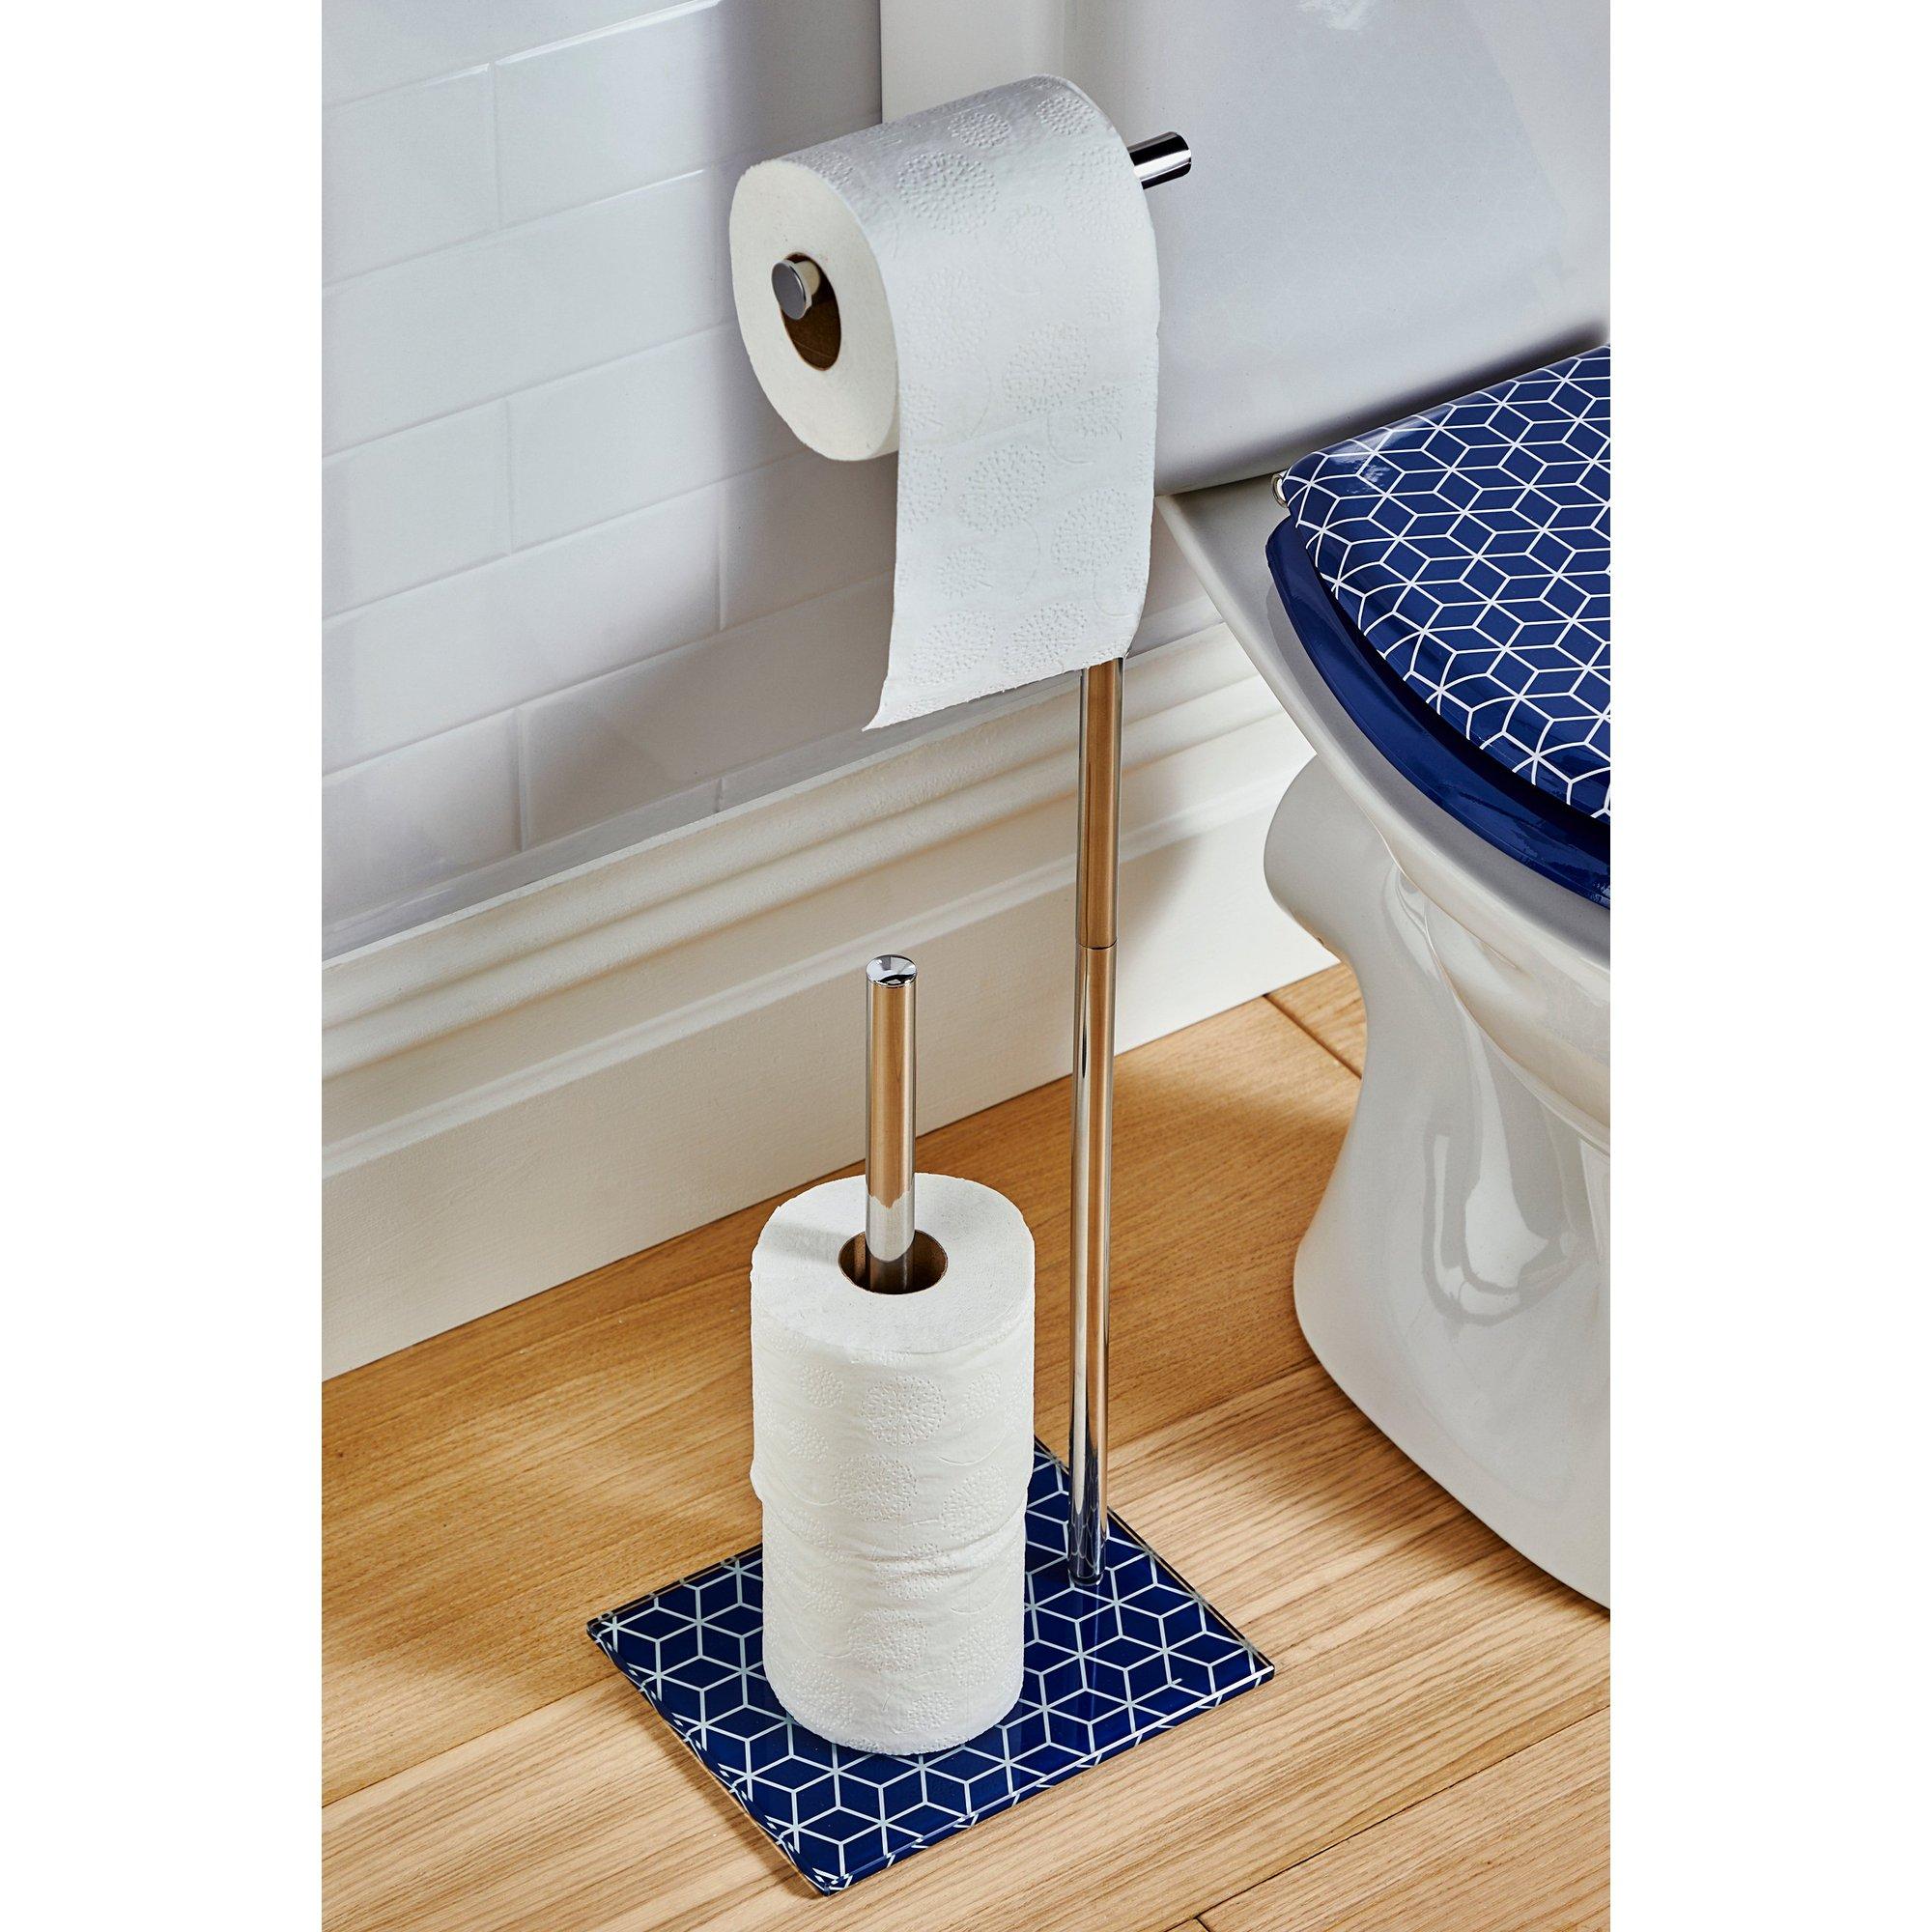 Image of Beldray Geometric Navy Toilet Roll Holder